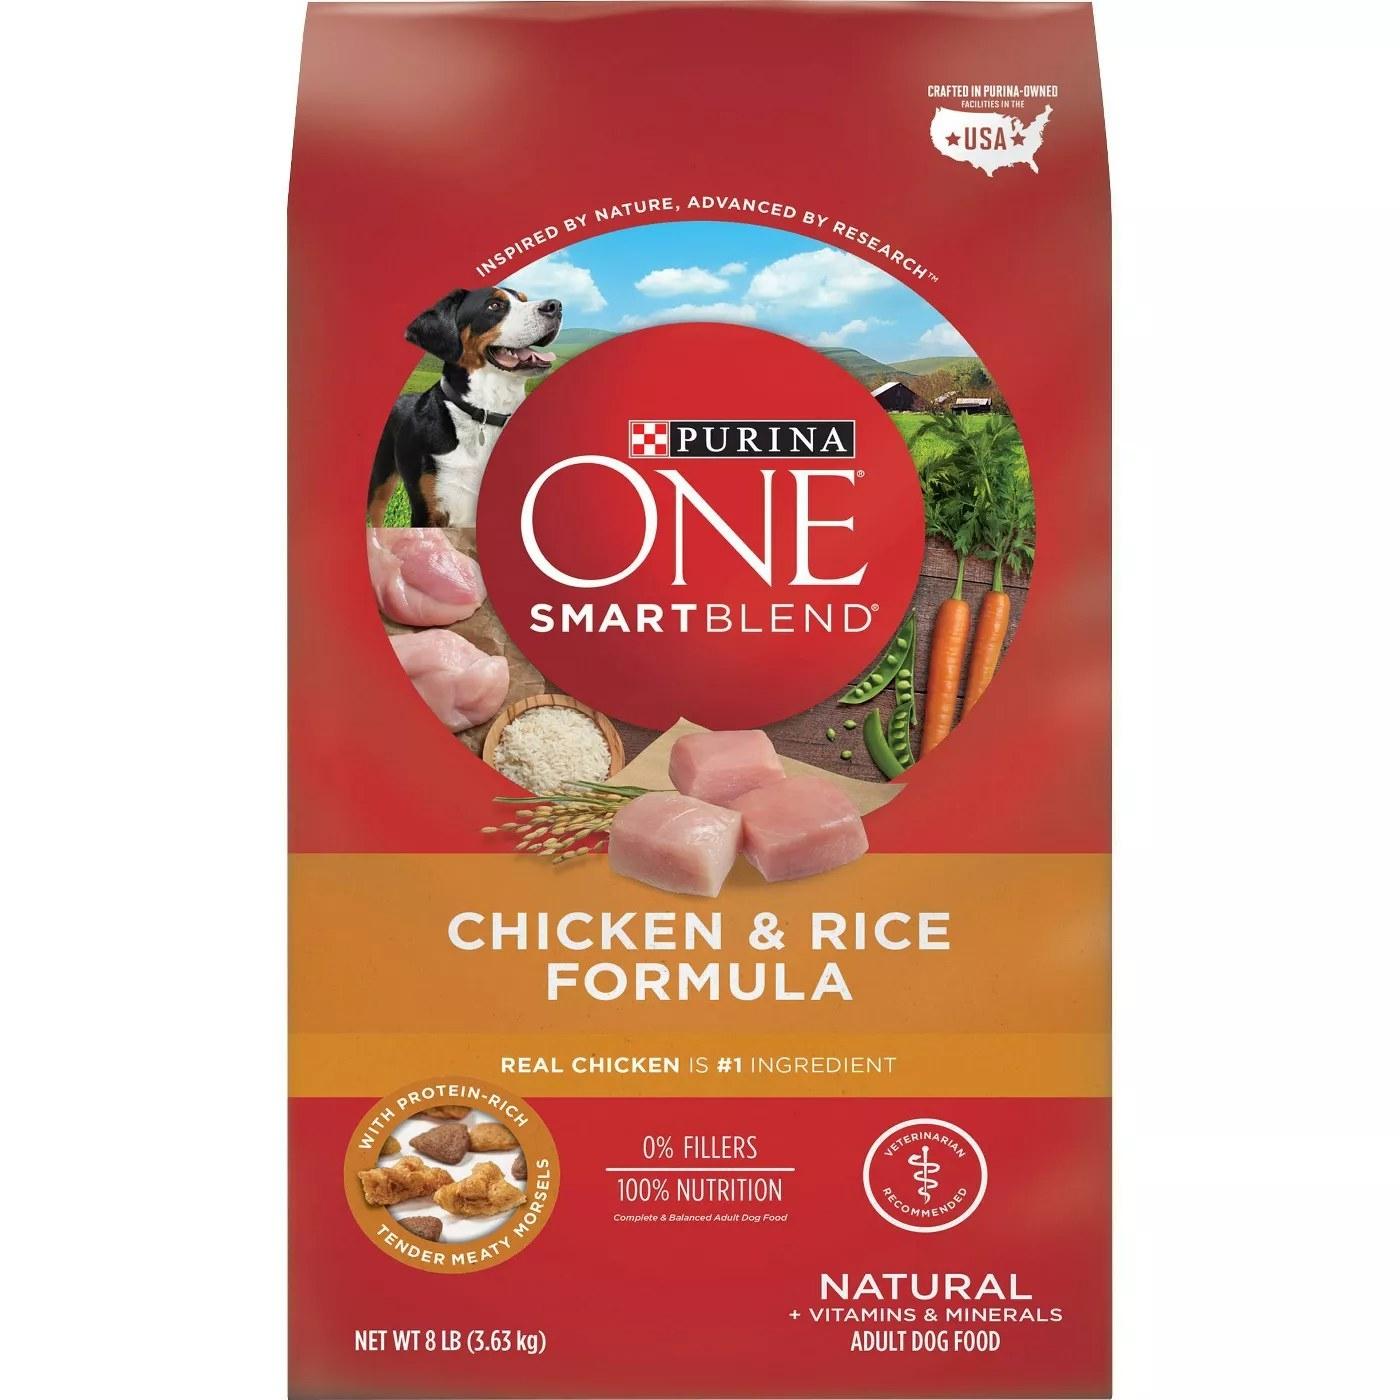 An 8-pound bag of Purina One Smart Blend Chicken & Rice Formula